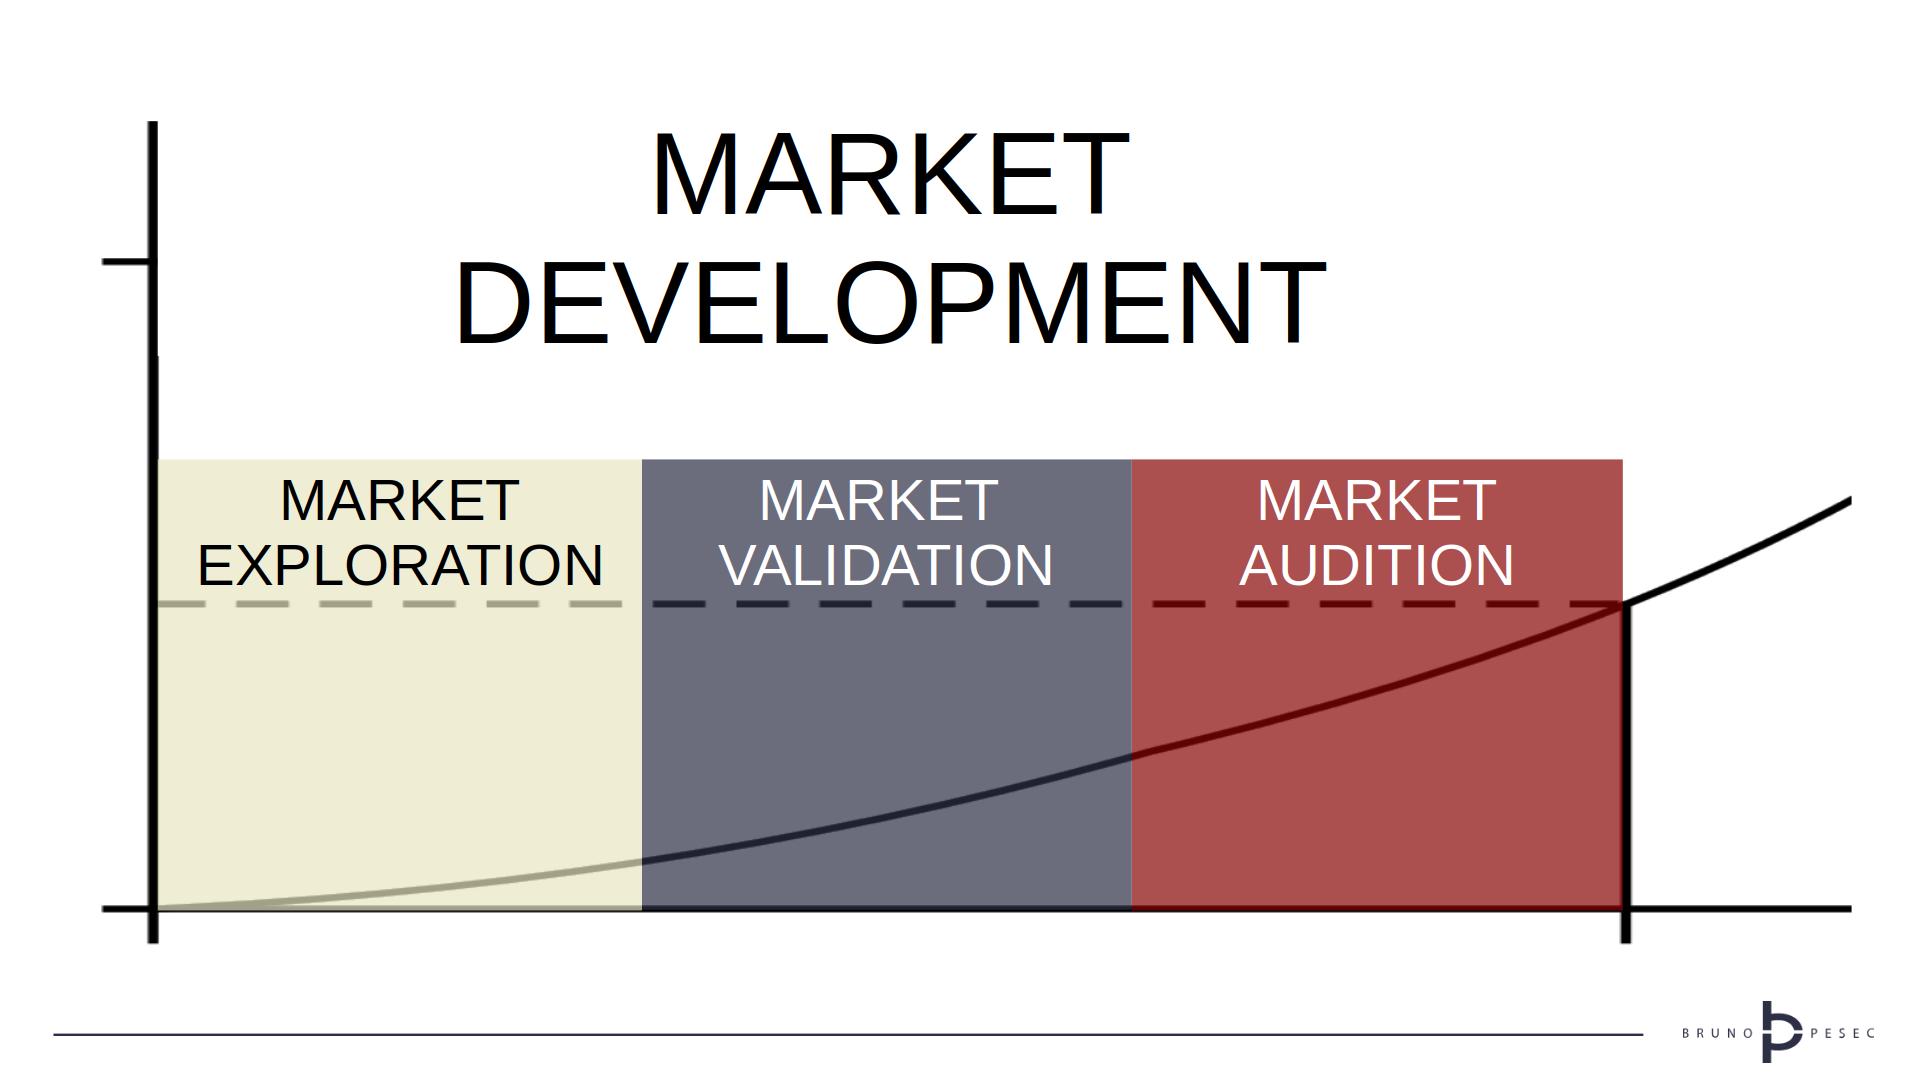 Granular view of market development (© Bruno Pešec, 2020)